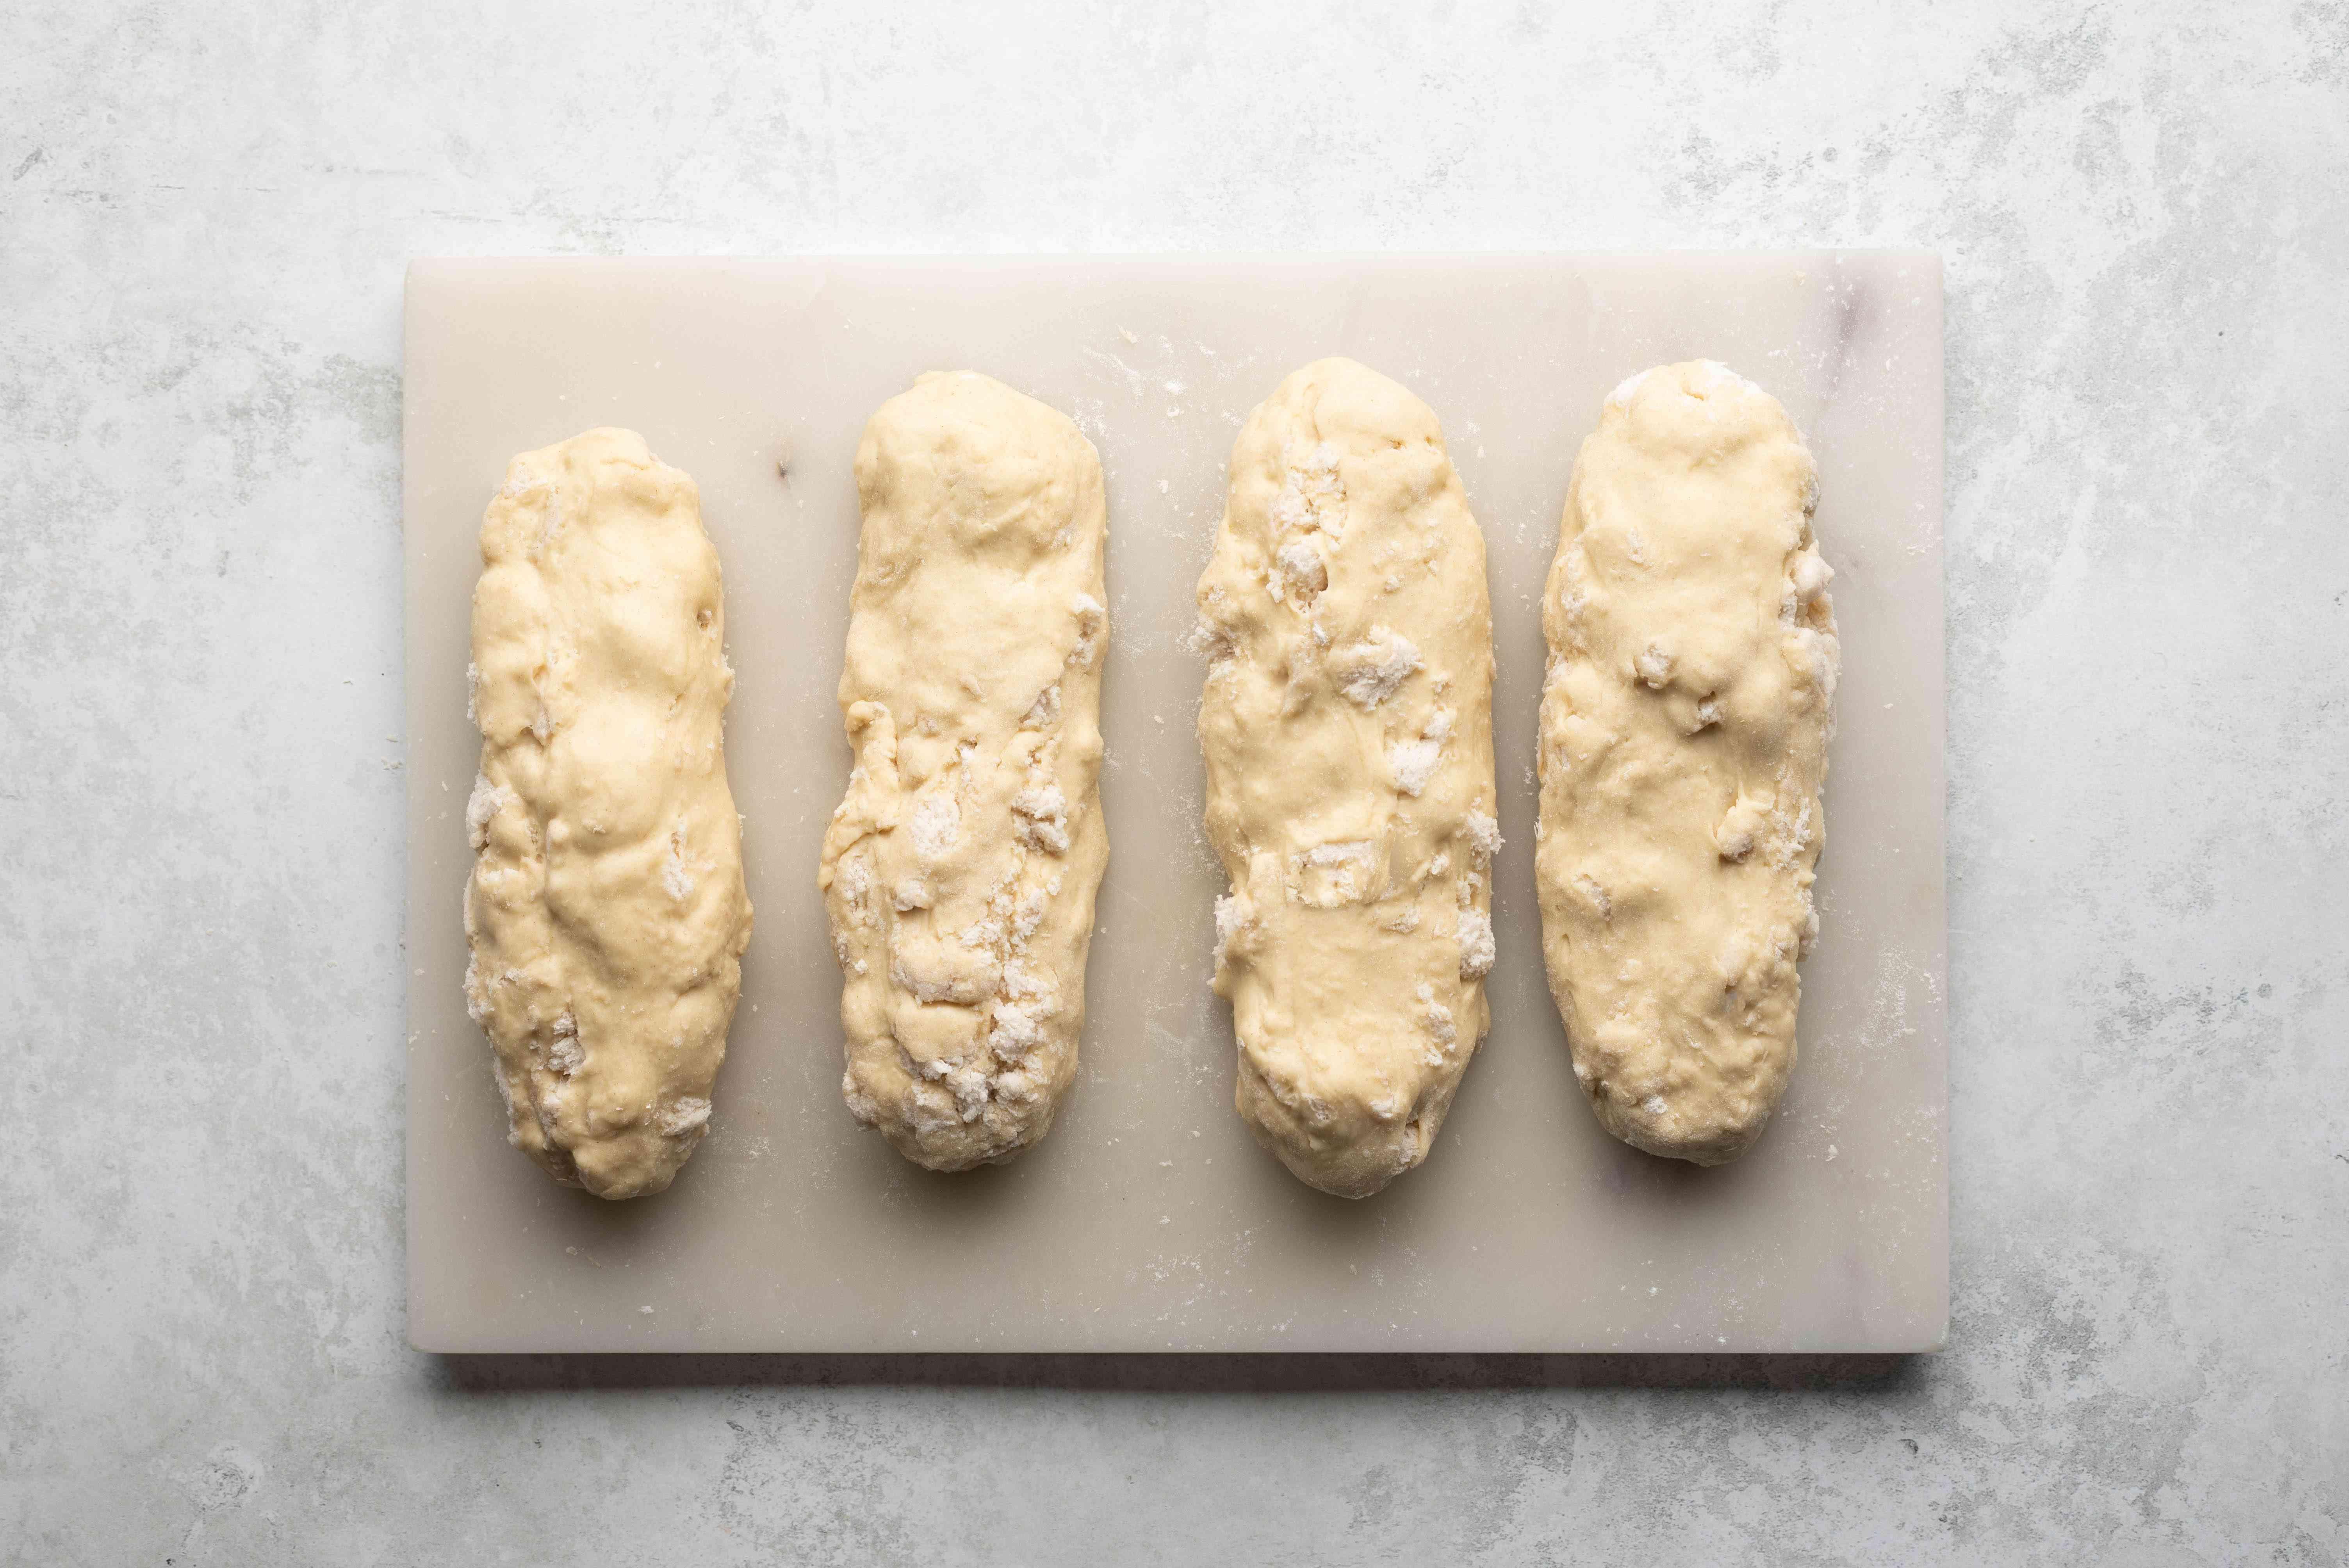 Dough shaped into four rolls